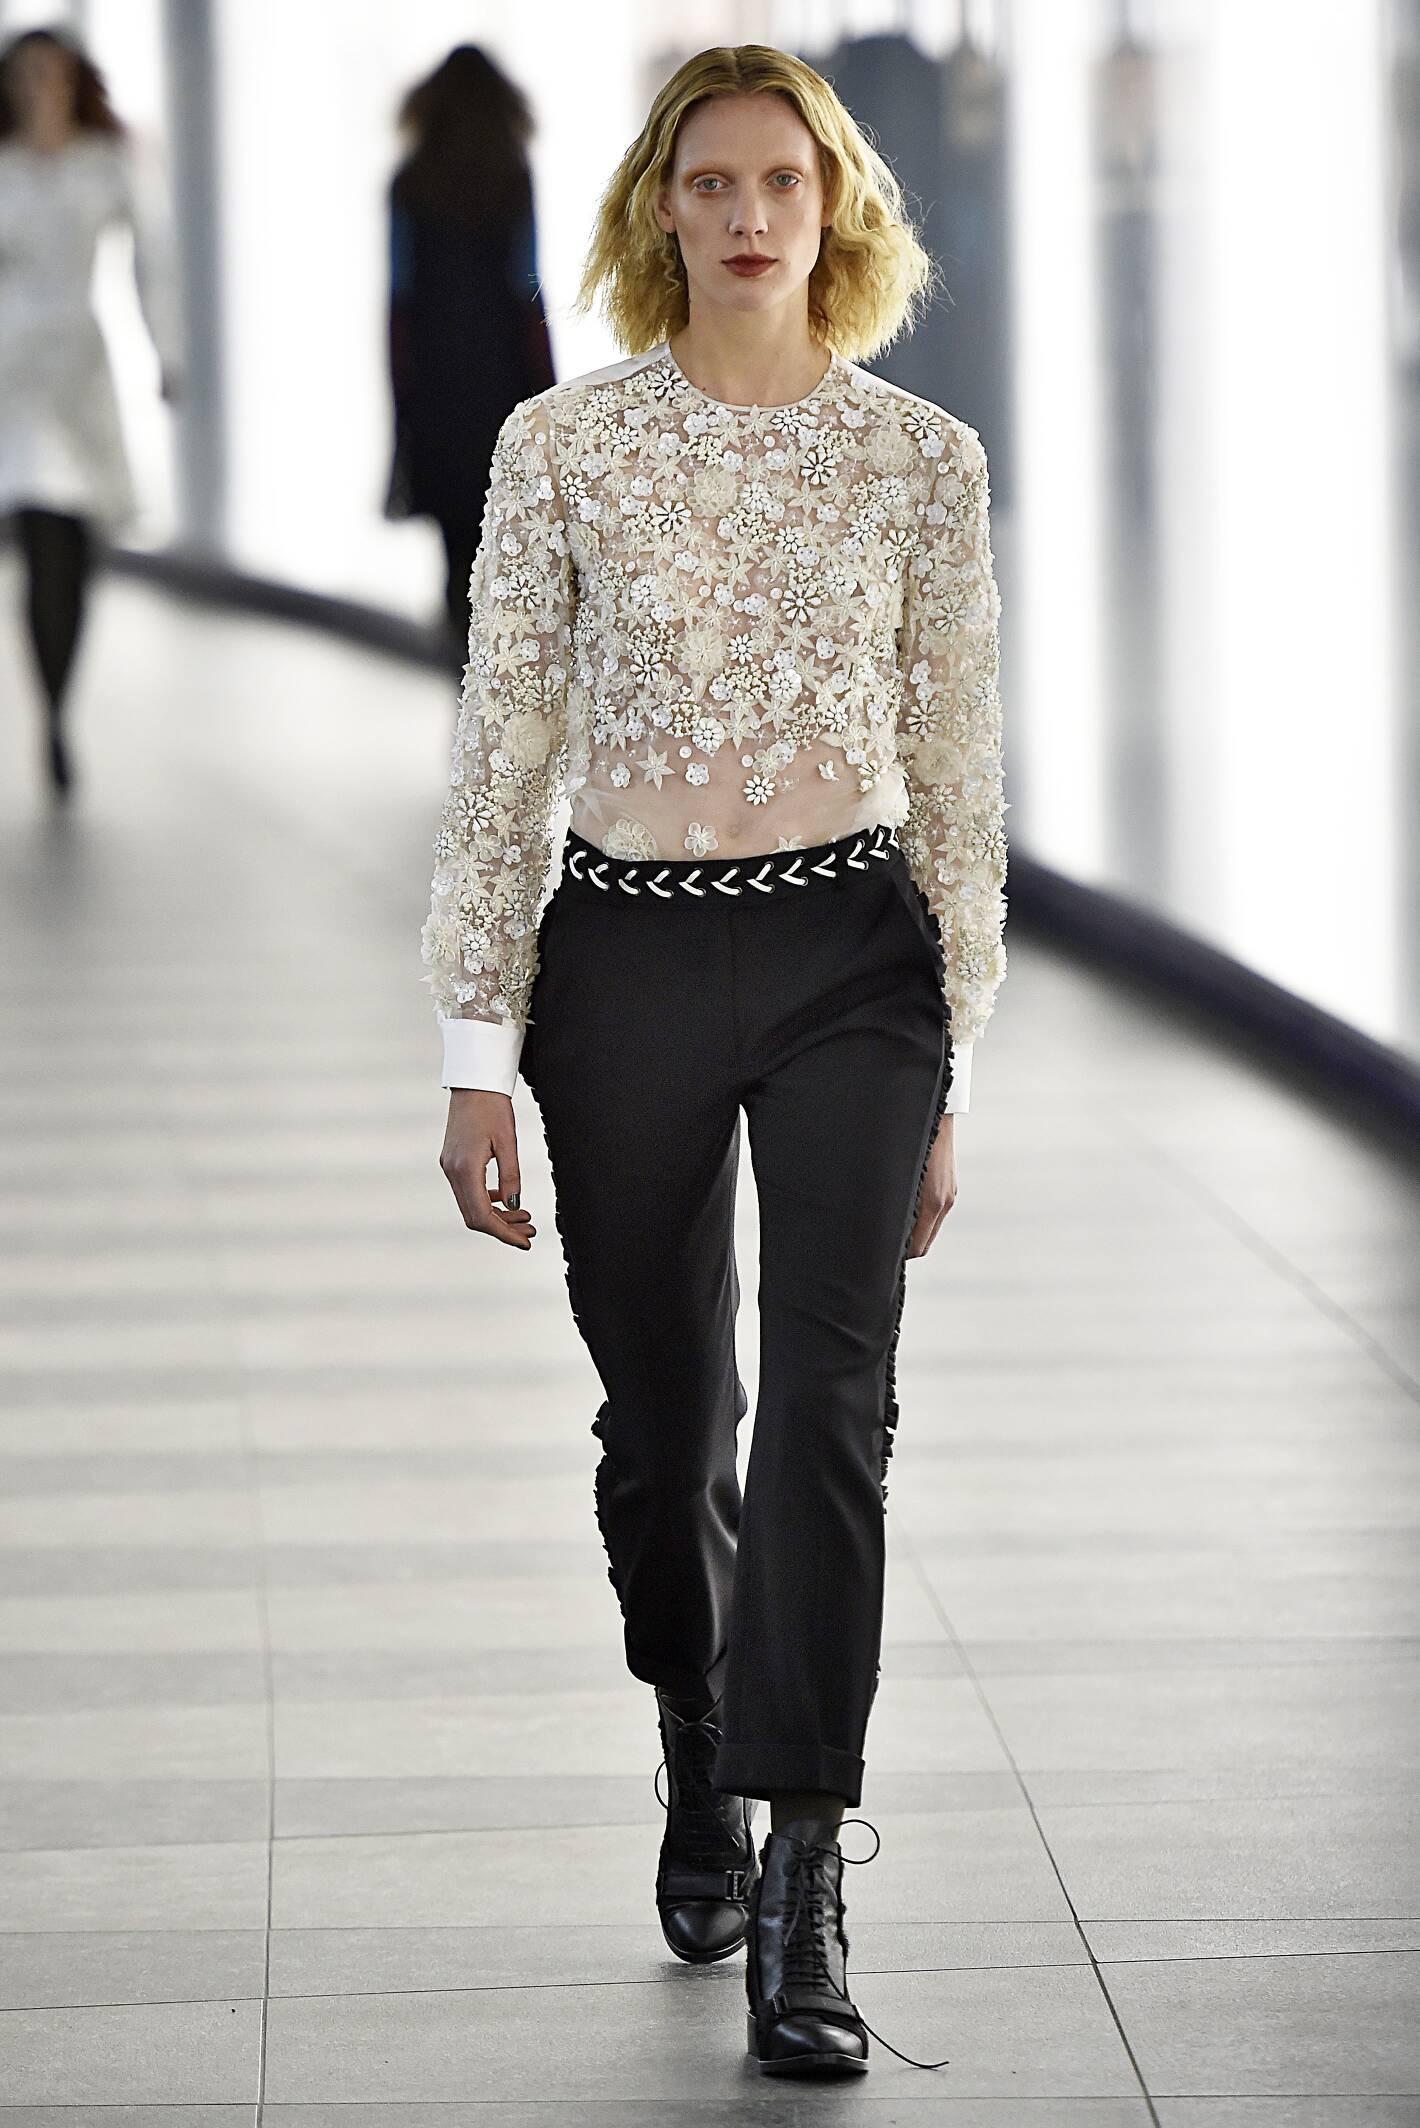 Fashion Woman Model Preen by Thornton Bregazzi Collection Catwalk